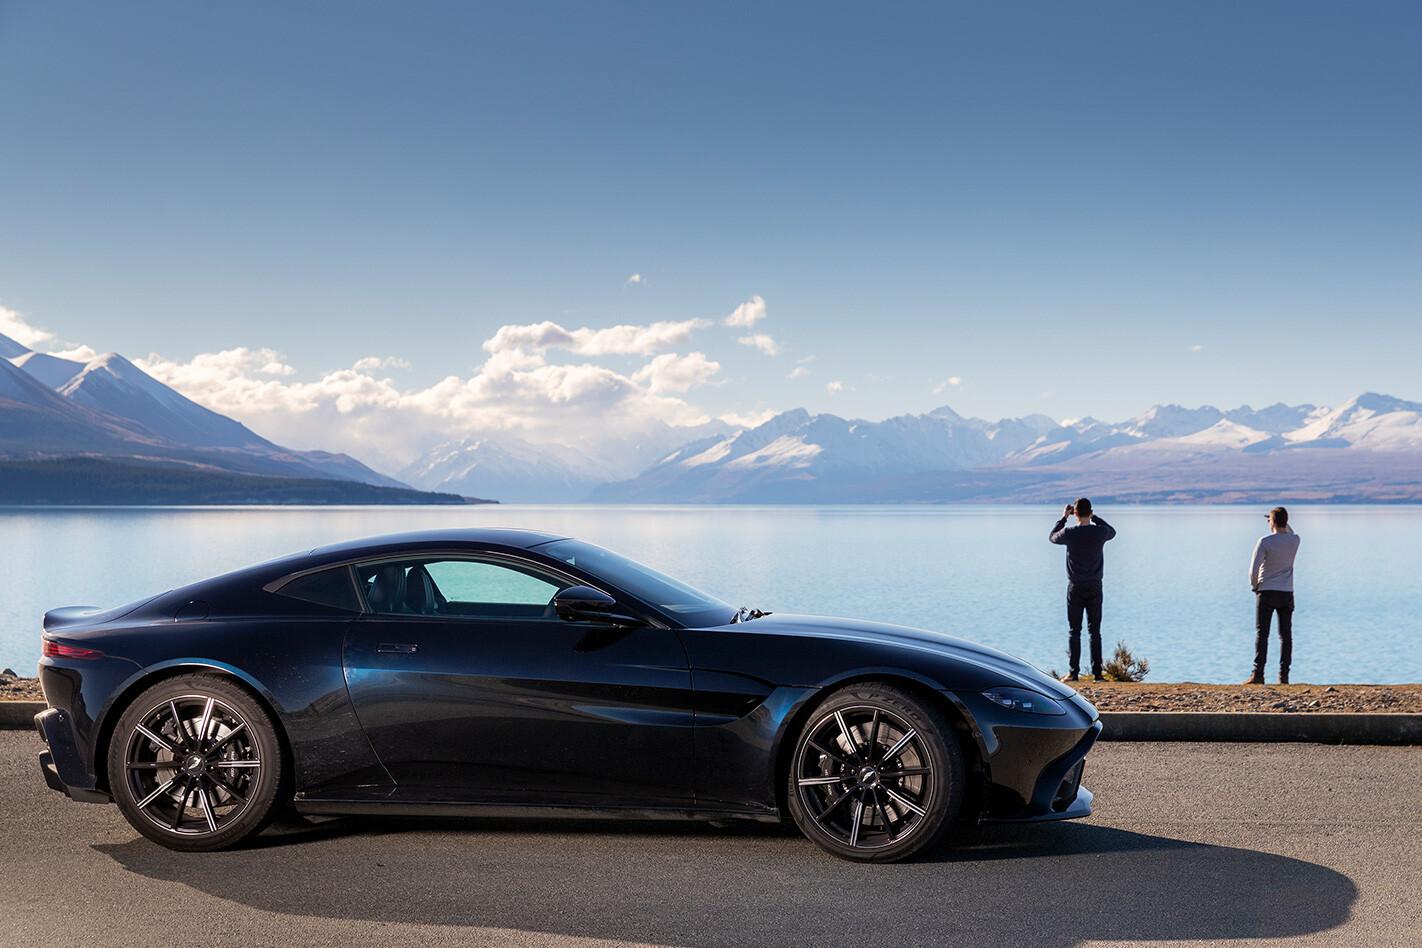 Aston Martin Vantage Sode Jpg